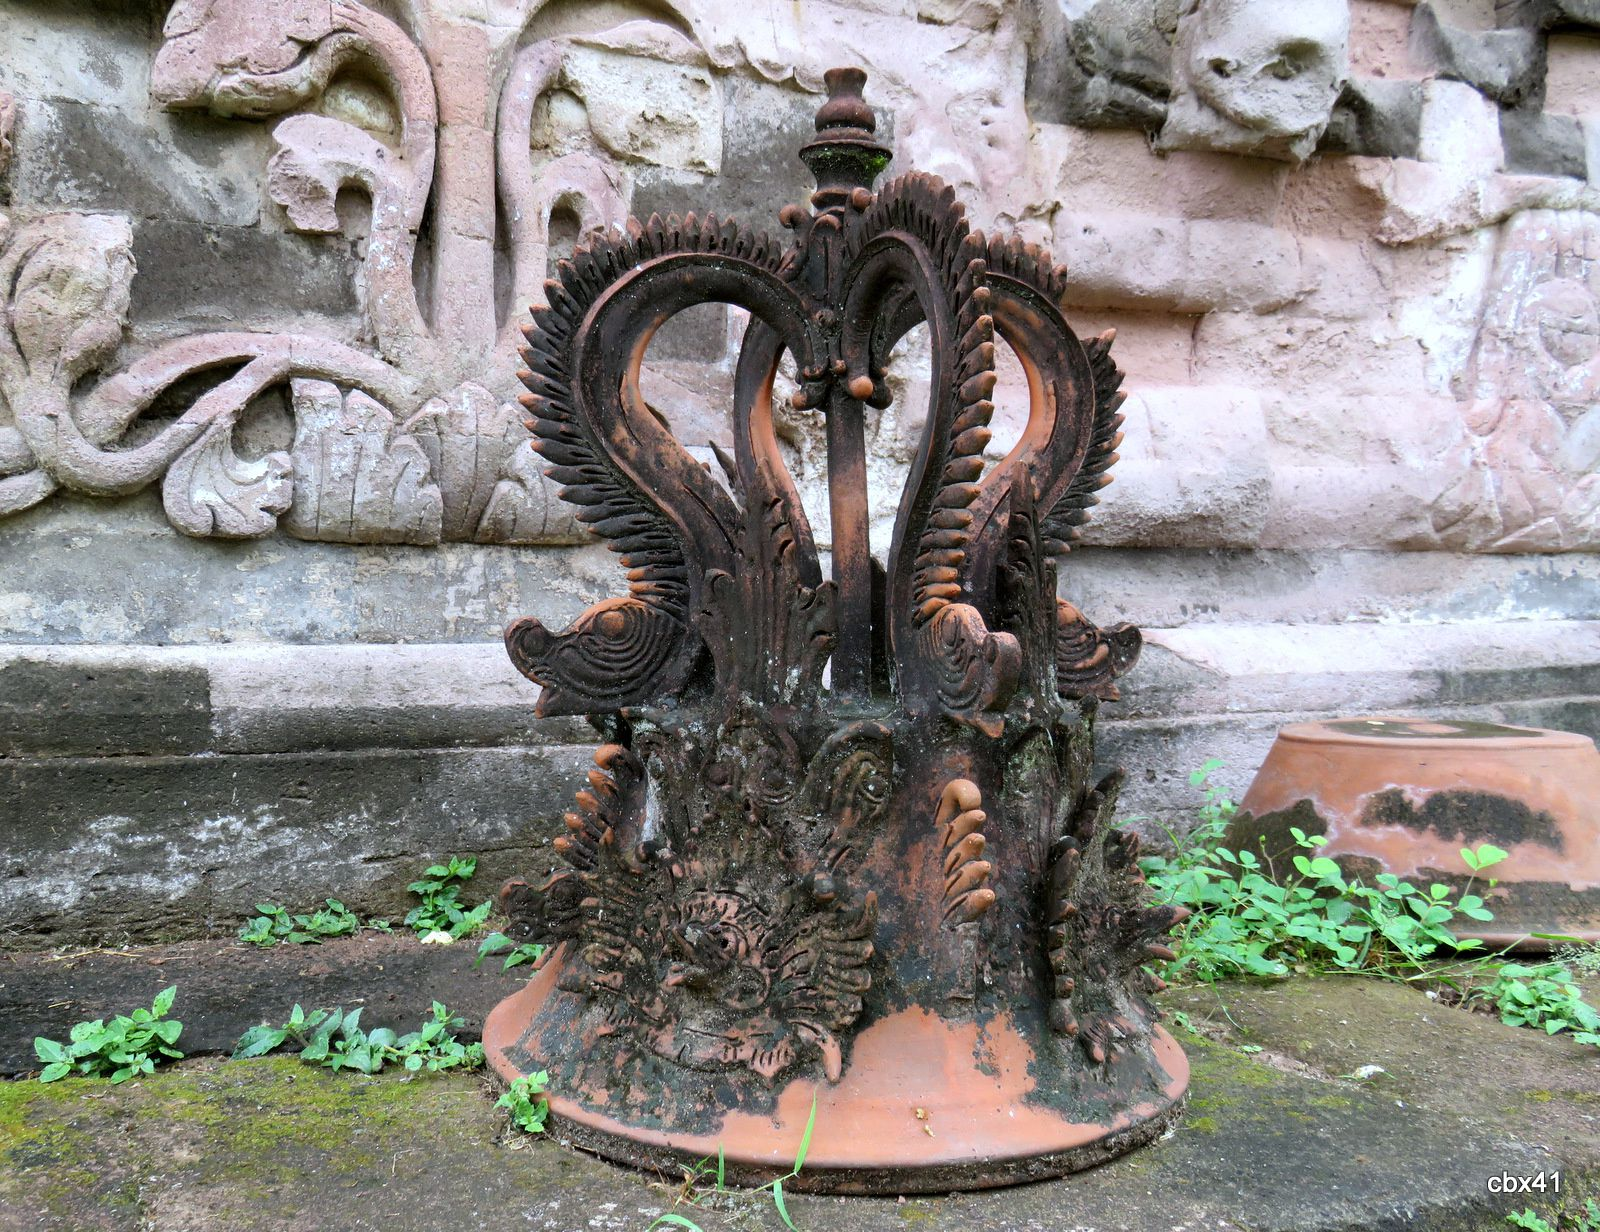 Temple Pura Beji, bananiers et fleurs (Bali, Indonésie)